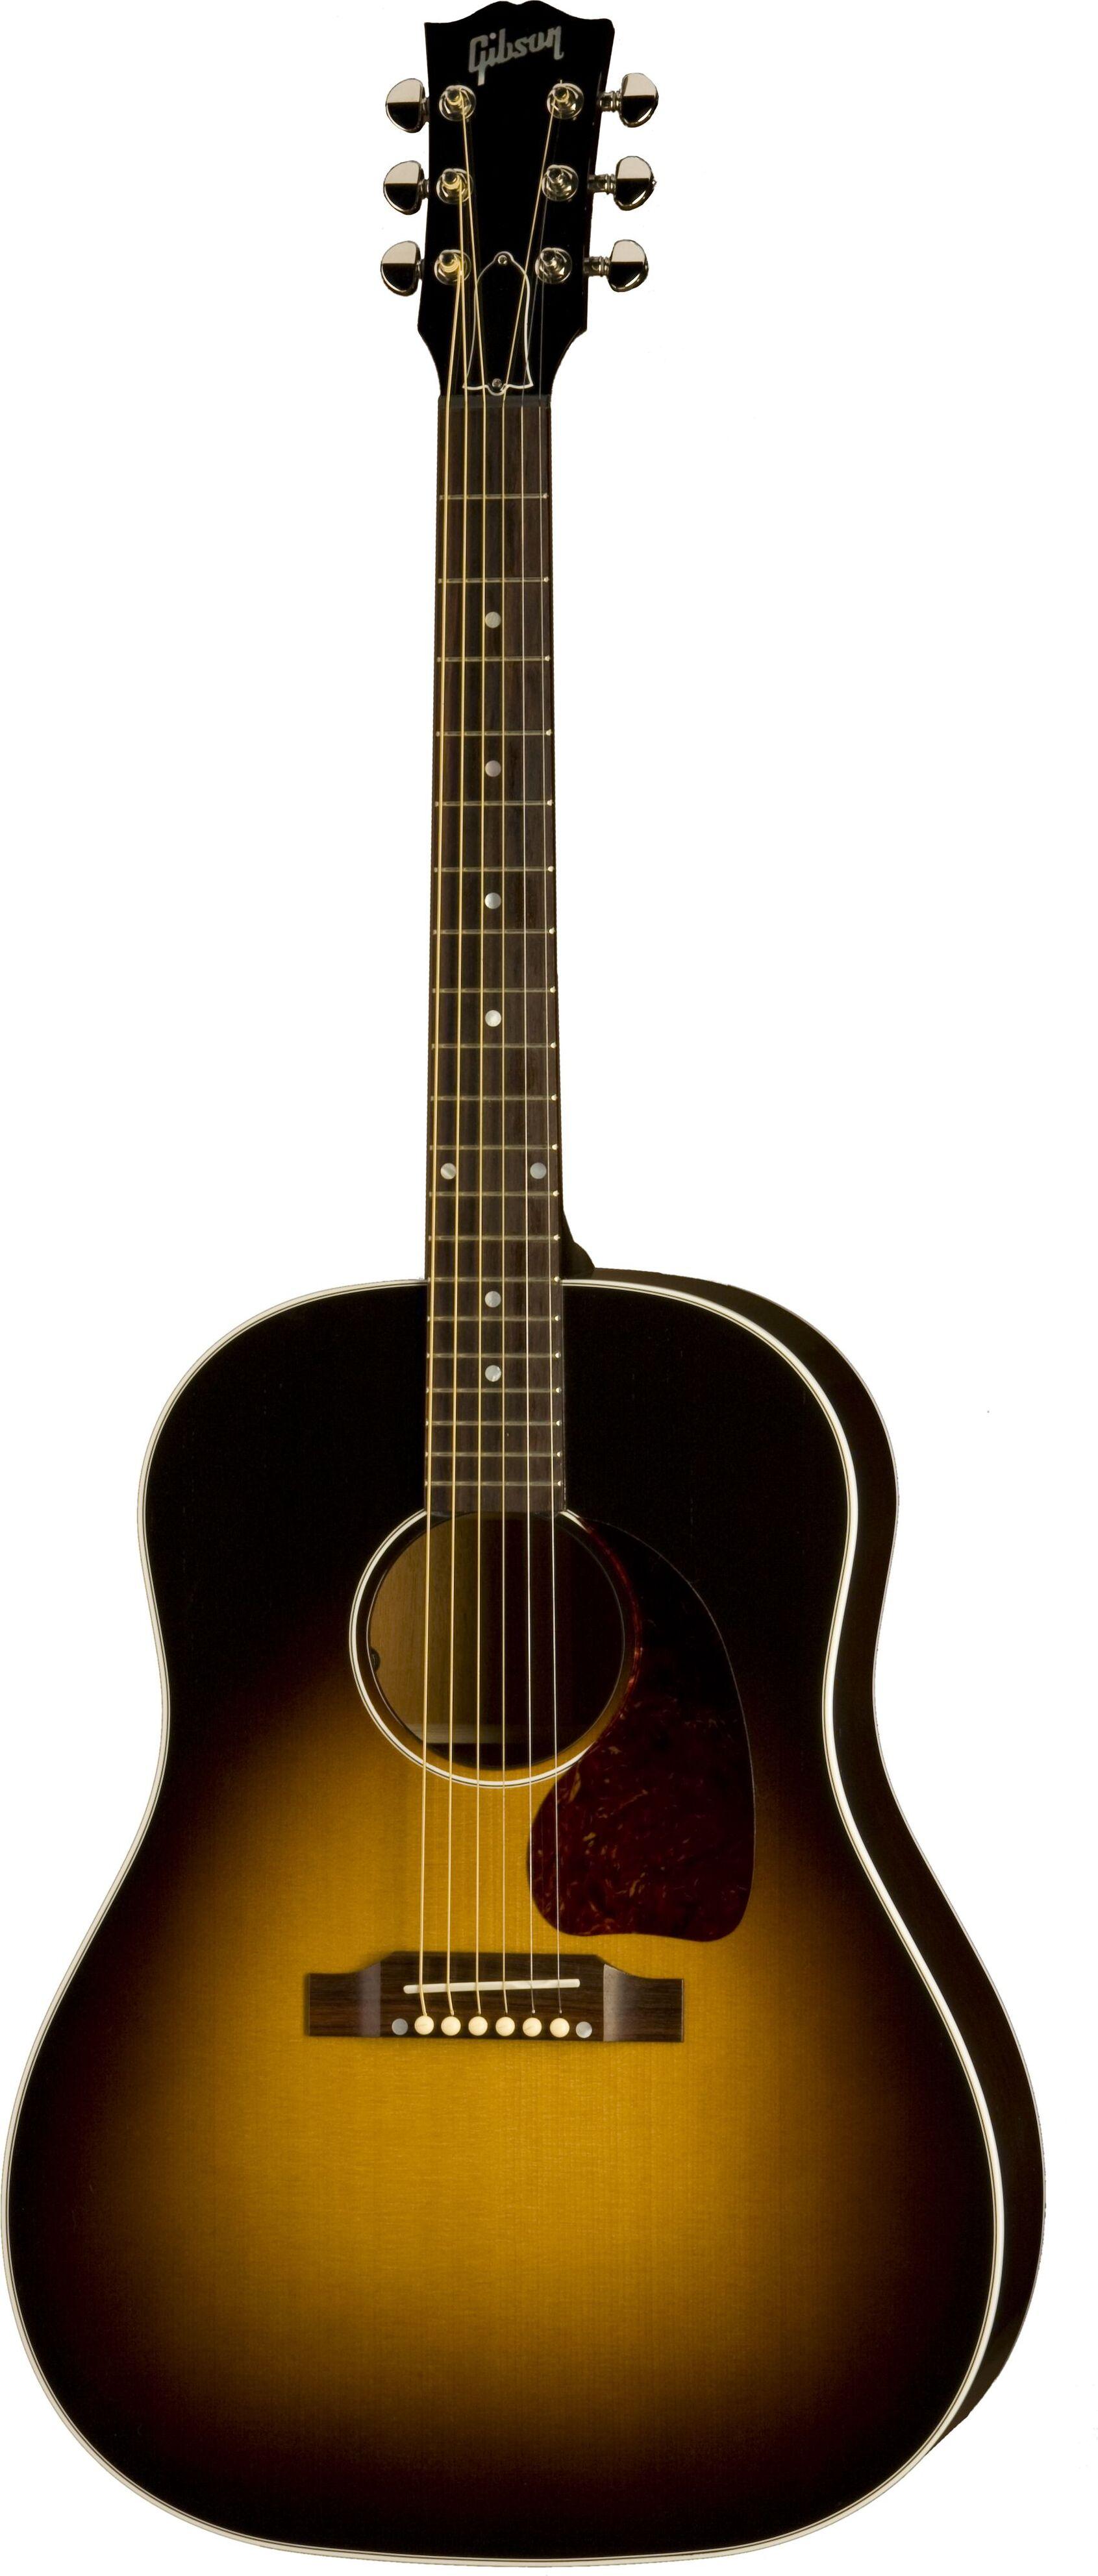 guitare gaucher occasion zikinf